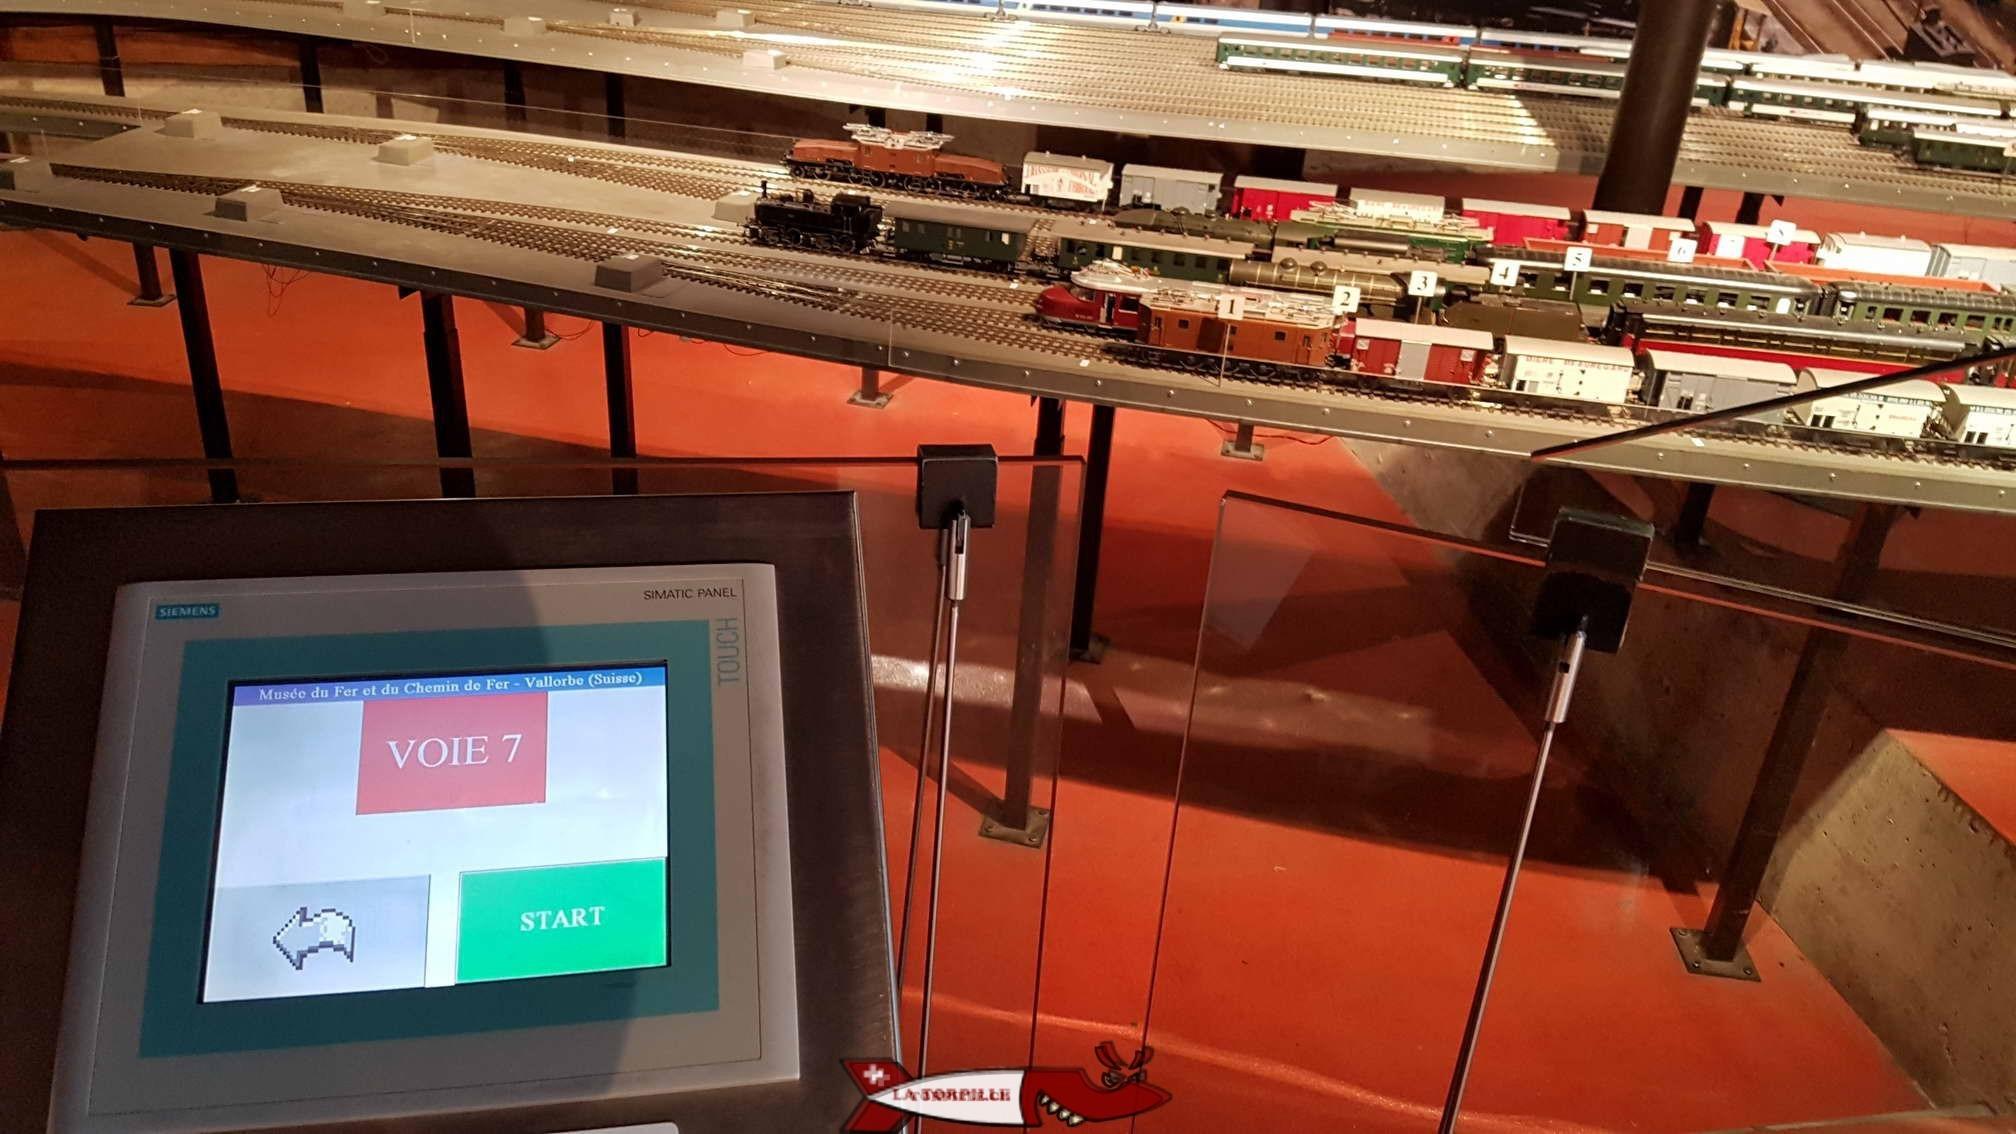 Musée du fer et du chemin de fer Vallorbe